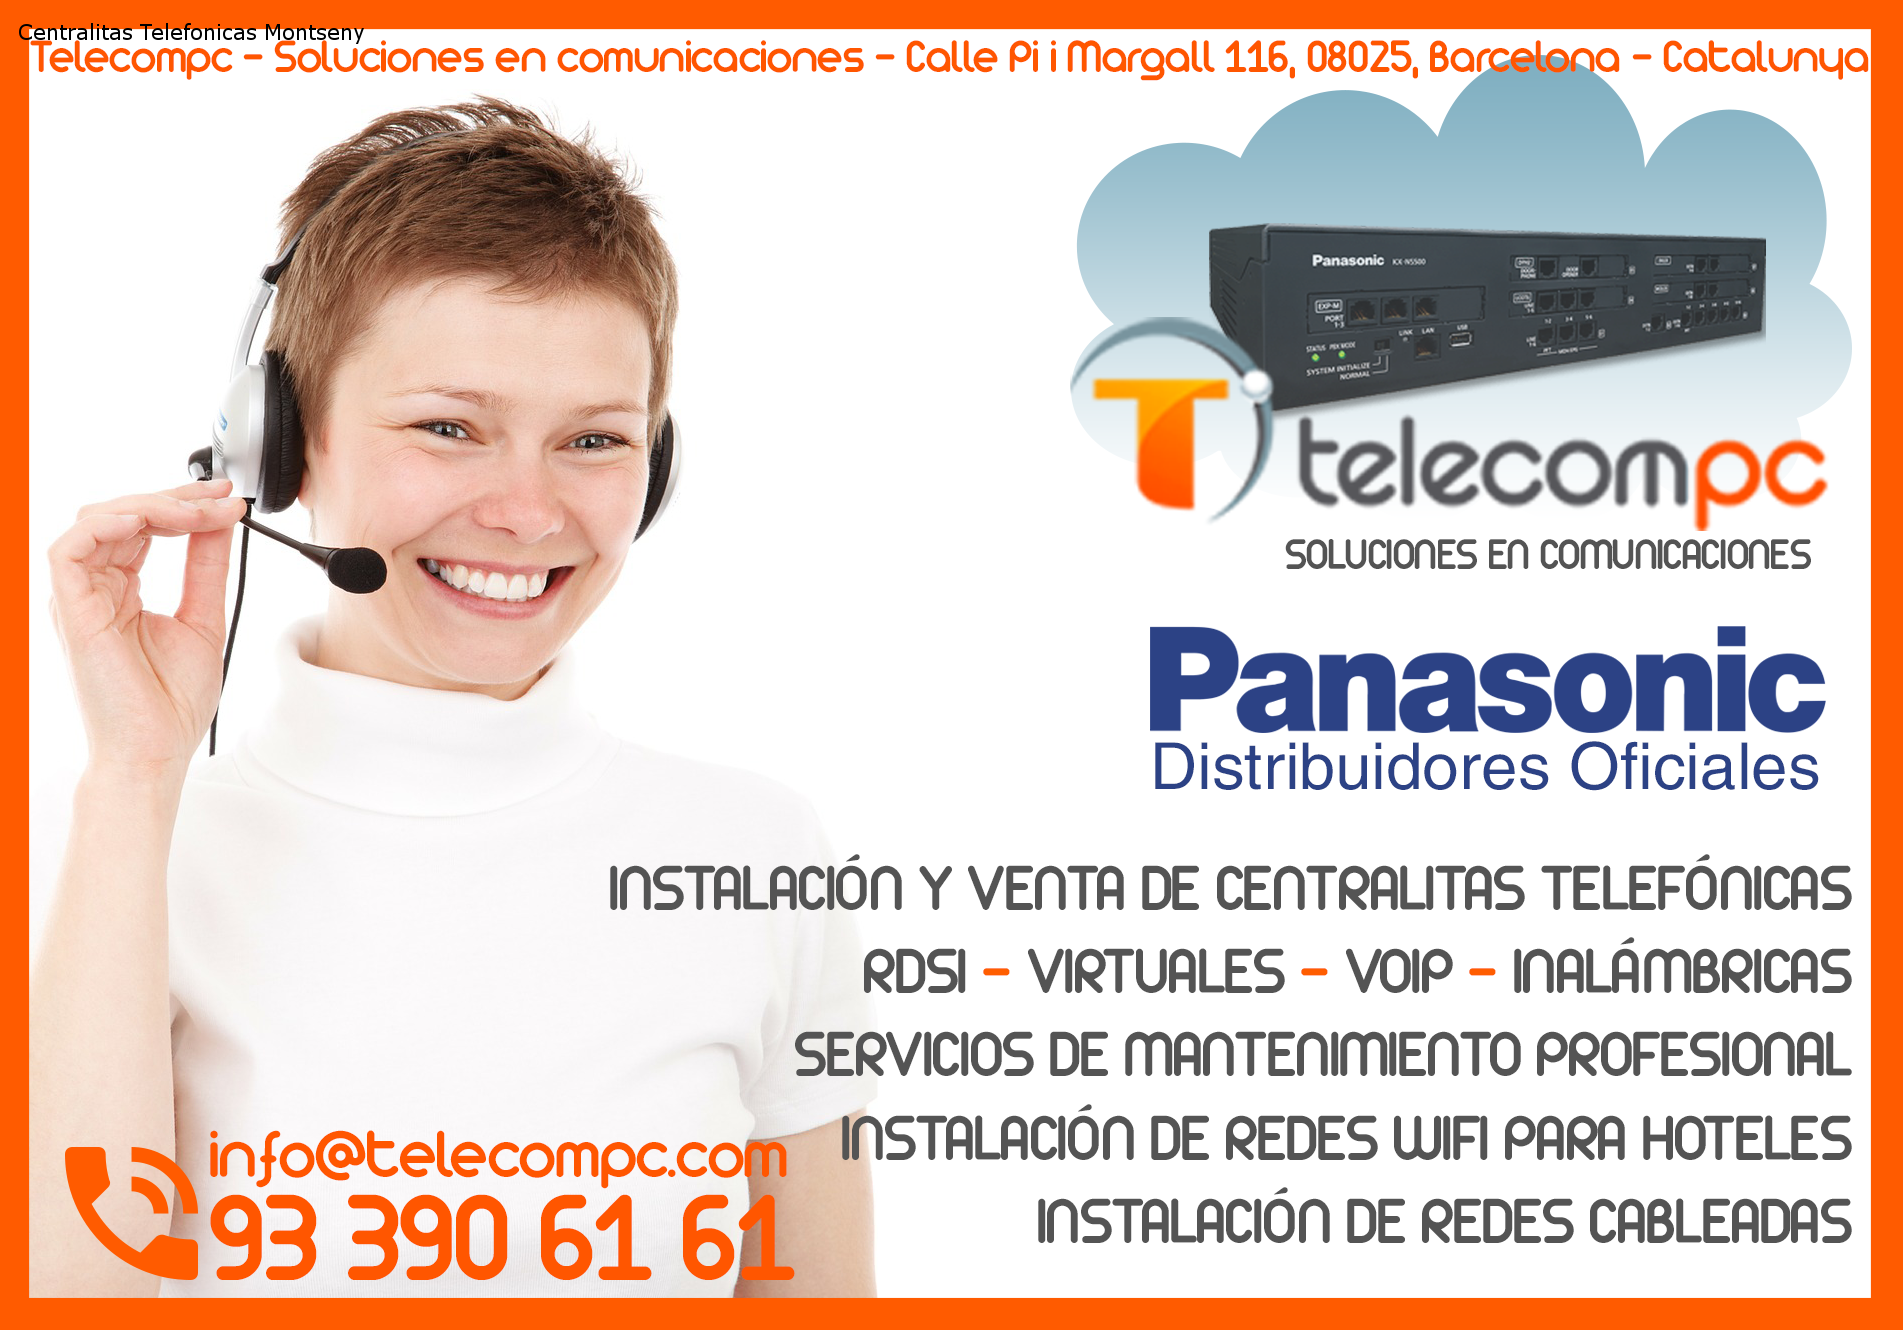 Centralitas Telefonicas Montseny